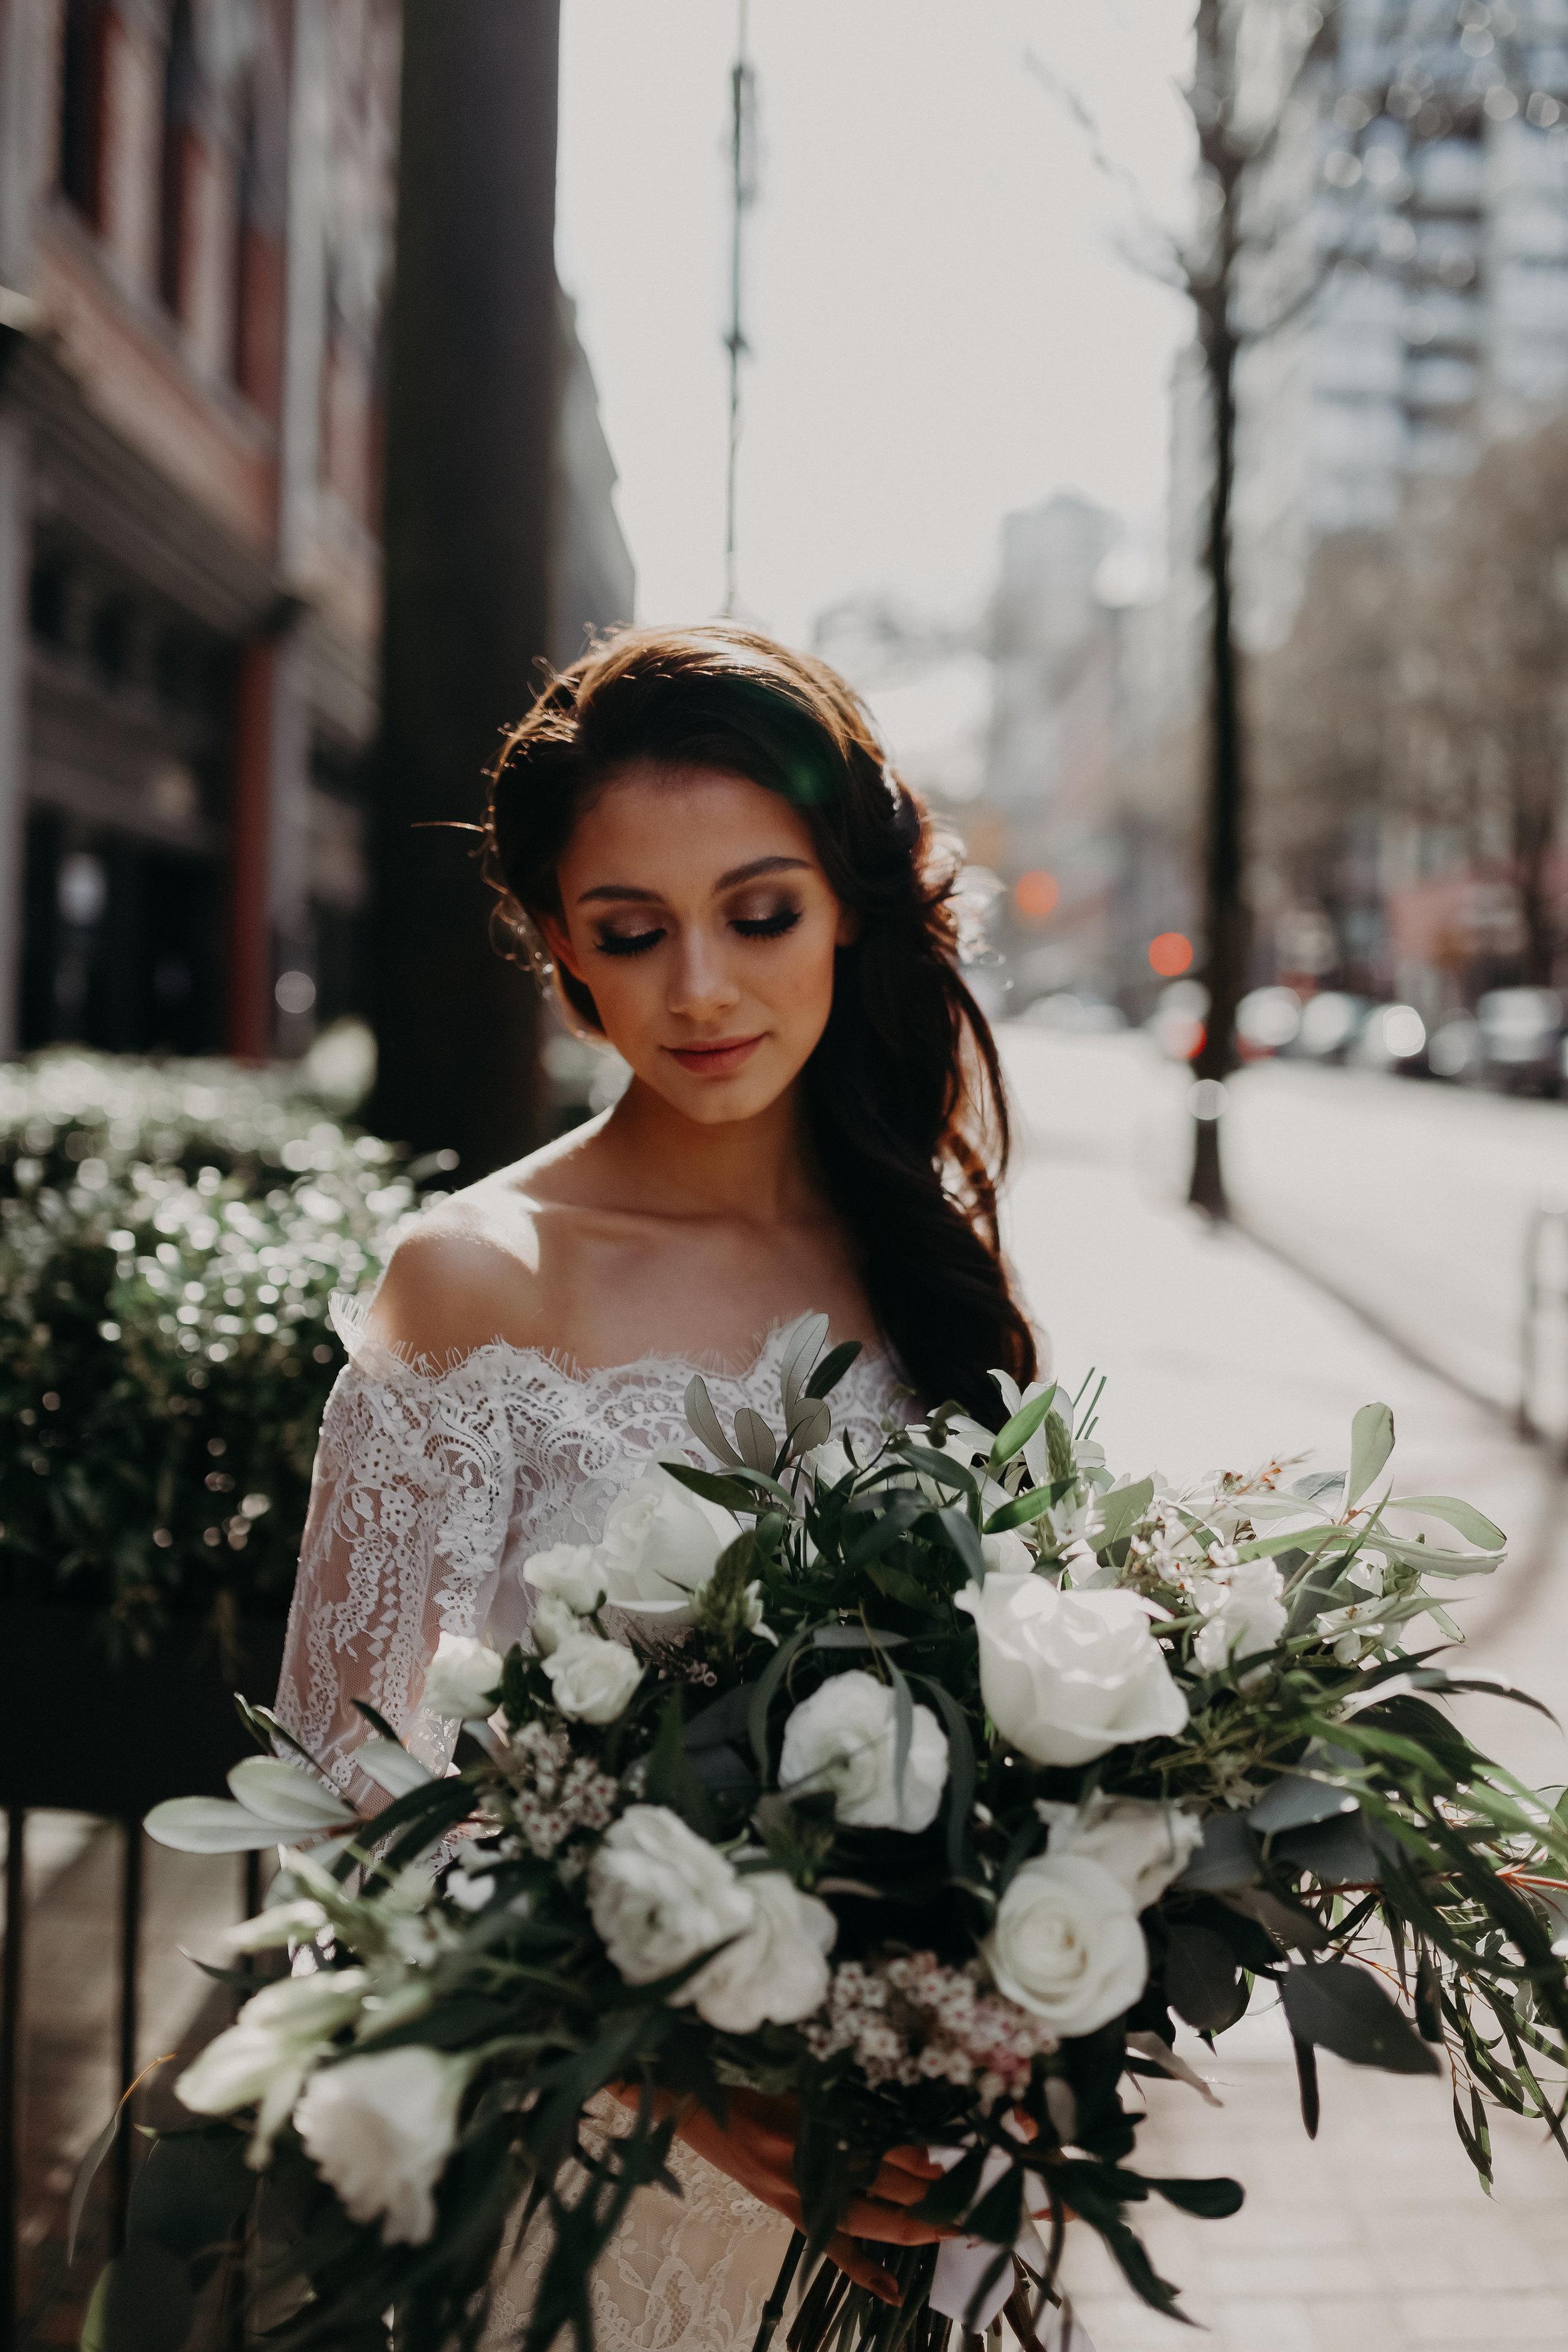 Model: Keira  Photographer: Sarah Arsenault  Creative Director: Divine Decor  Floral Arrangements: Divine Decor  Hair and Makeup: Ax Art Makeup